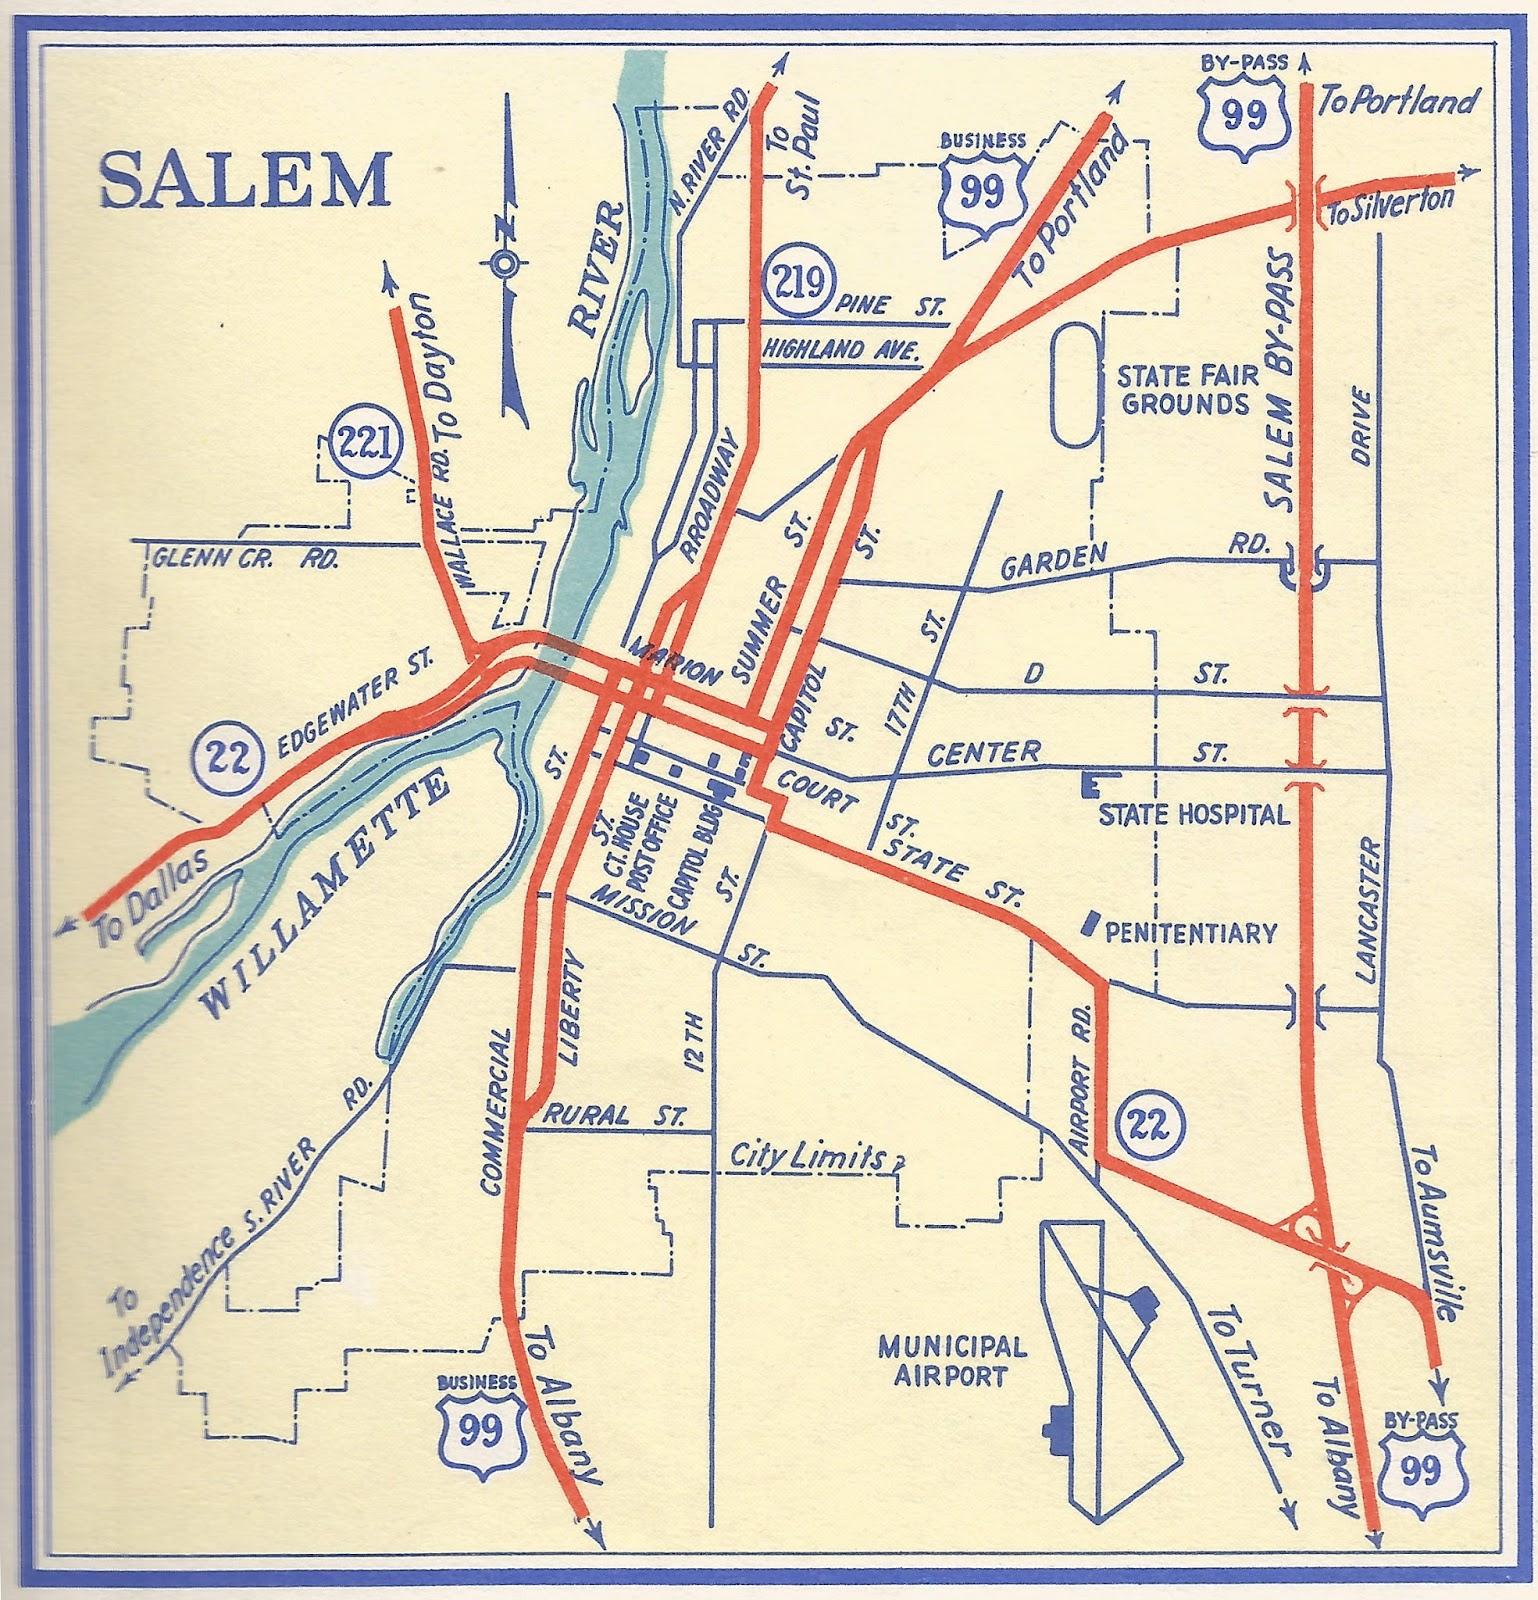 The ZehnKatzen Times maps Salem Oregon Within Her 1956 Boundaries